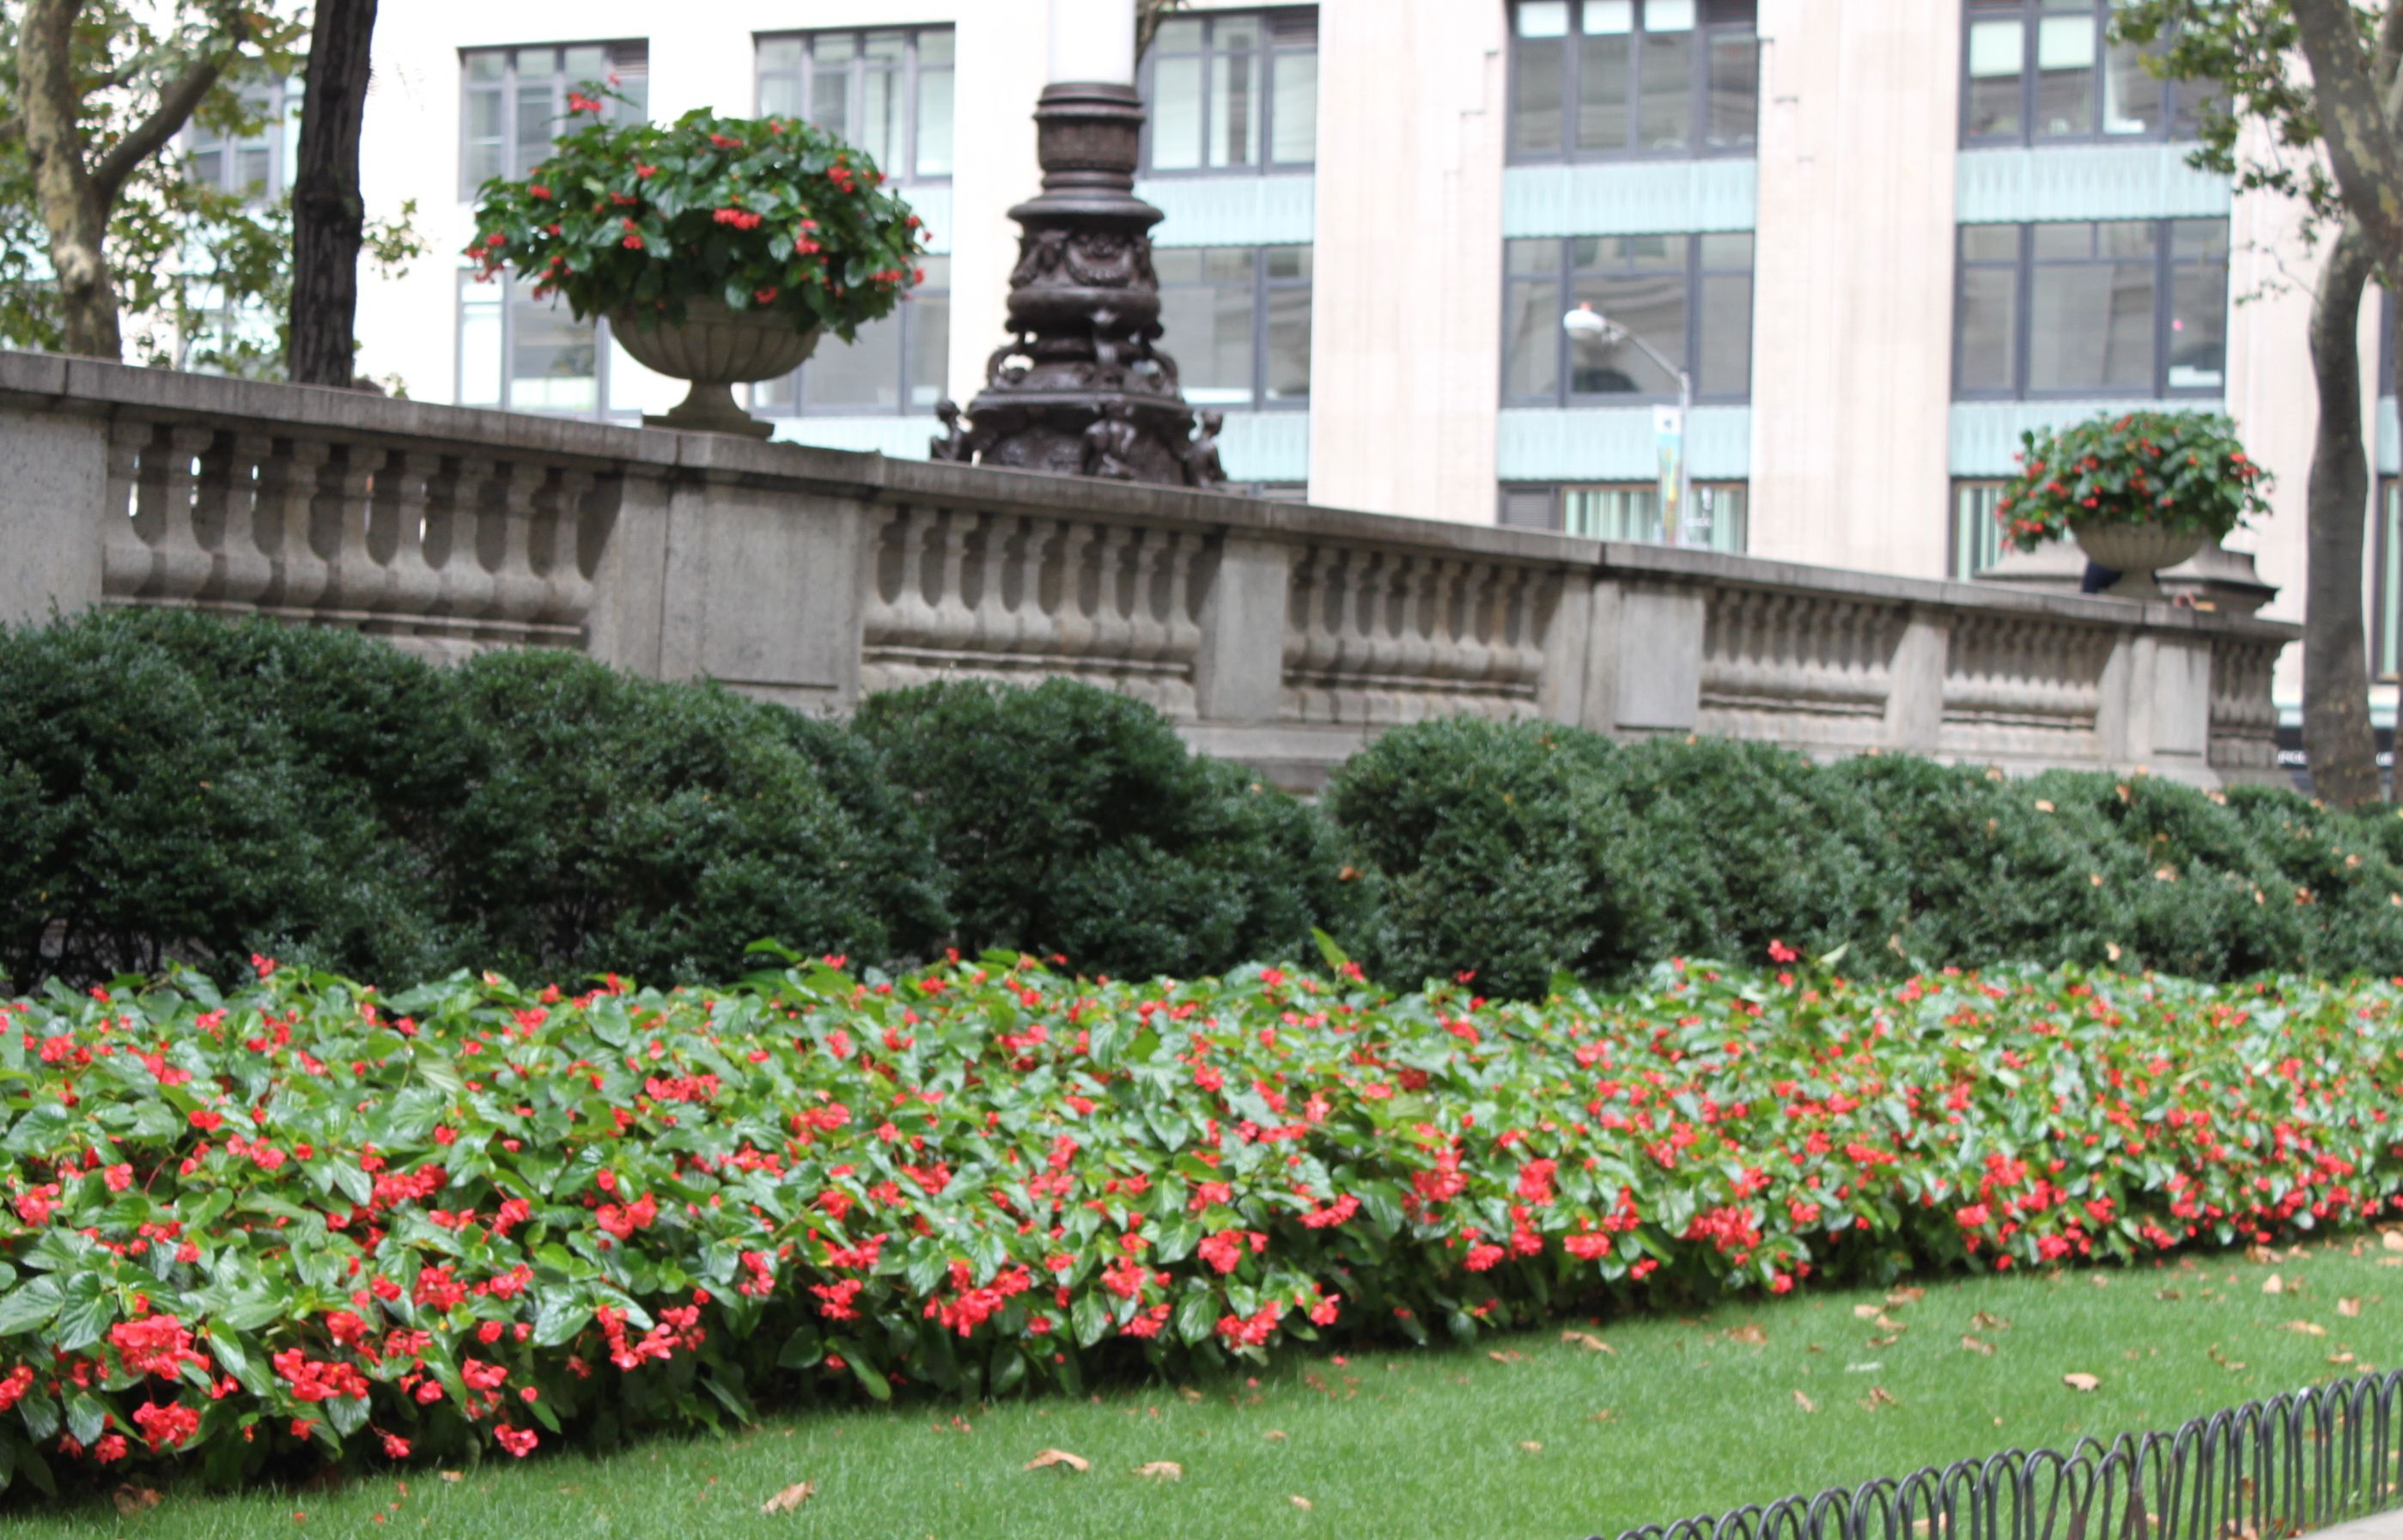 5th Avenue Garden. NYC 2012.